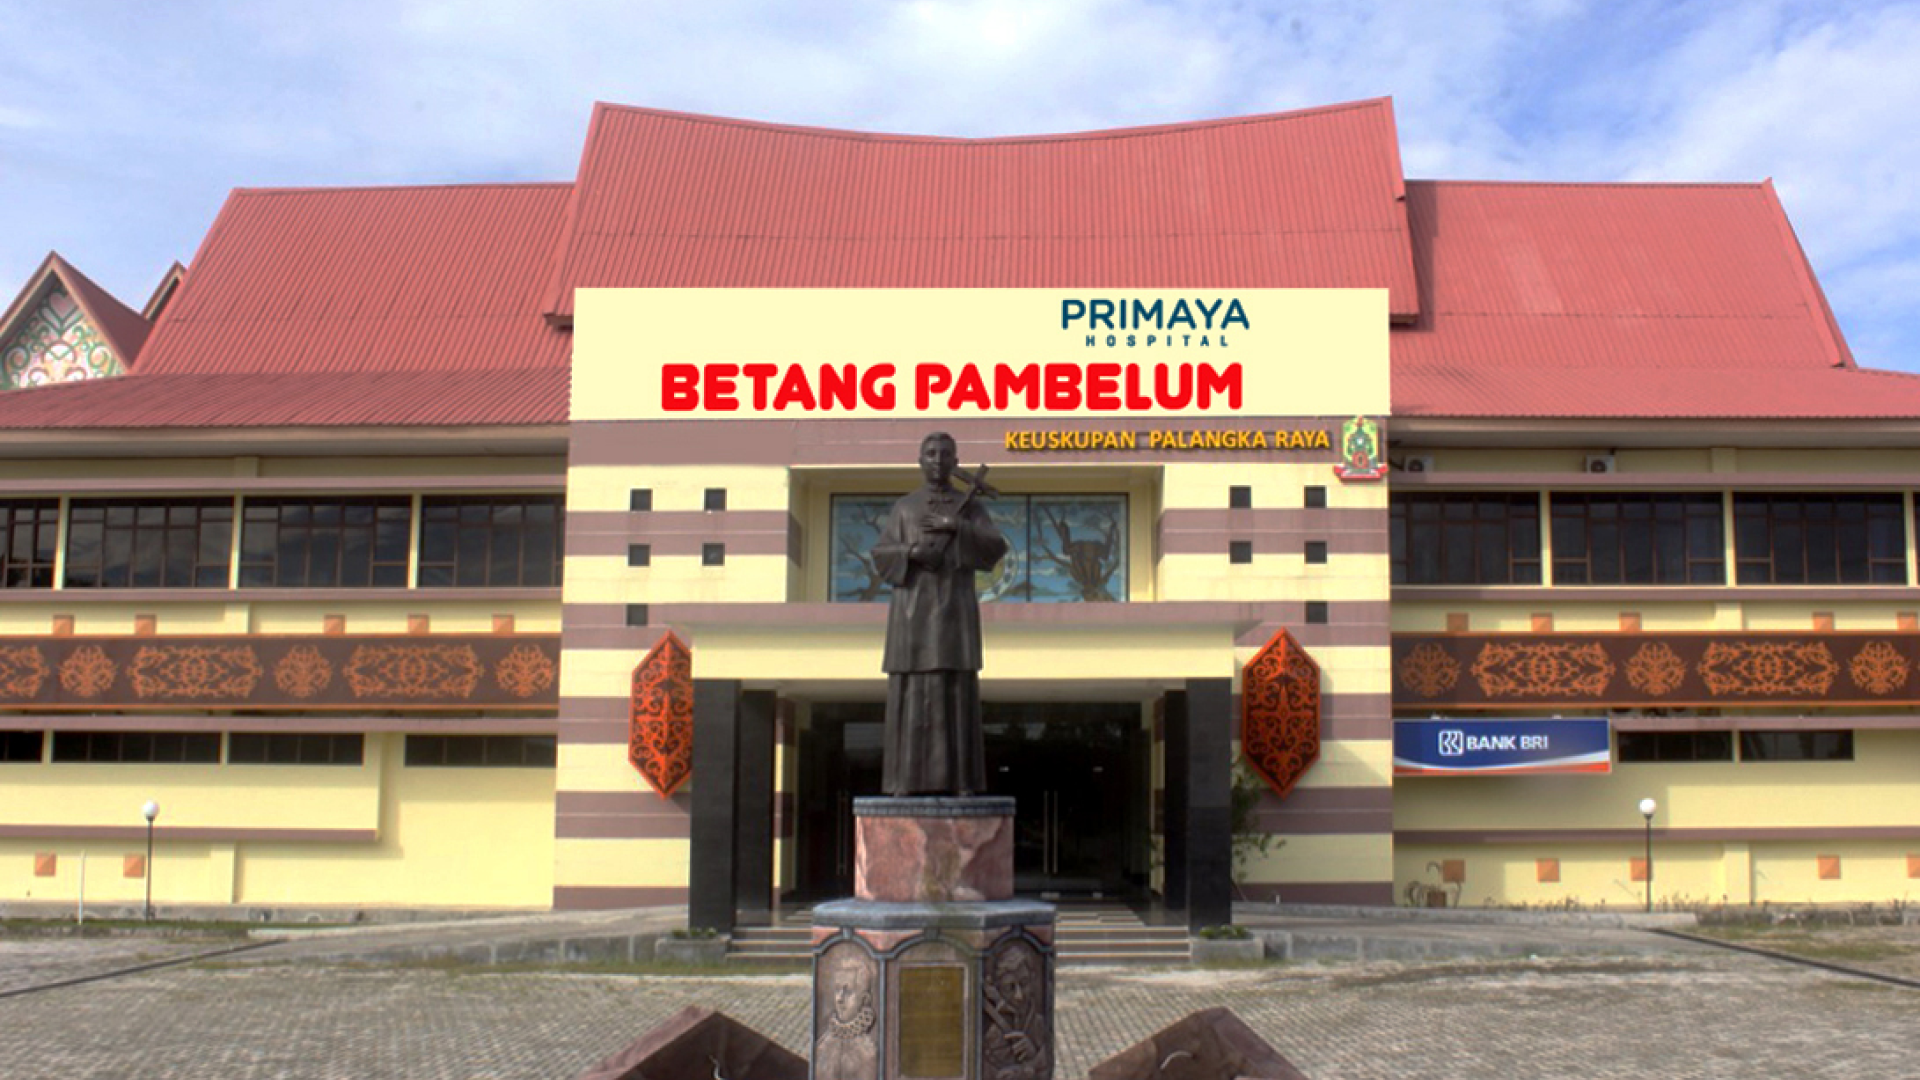 Primaya Hospital Betang Pambelum